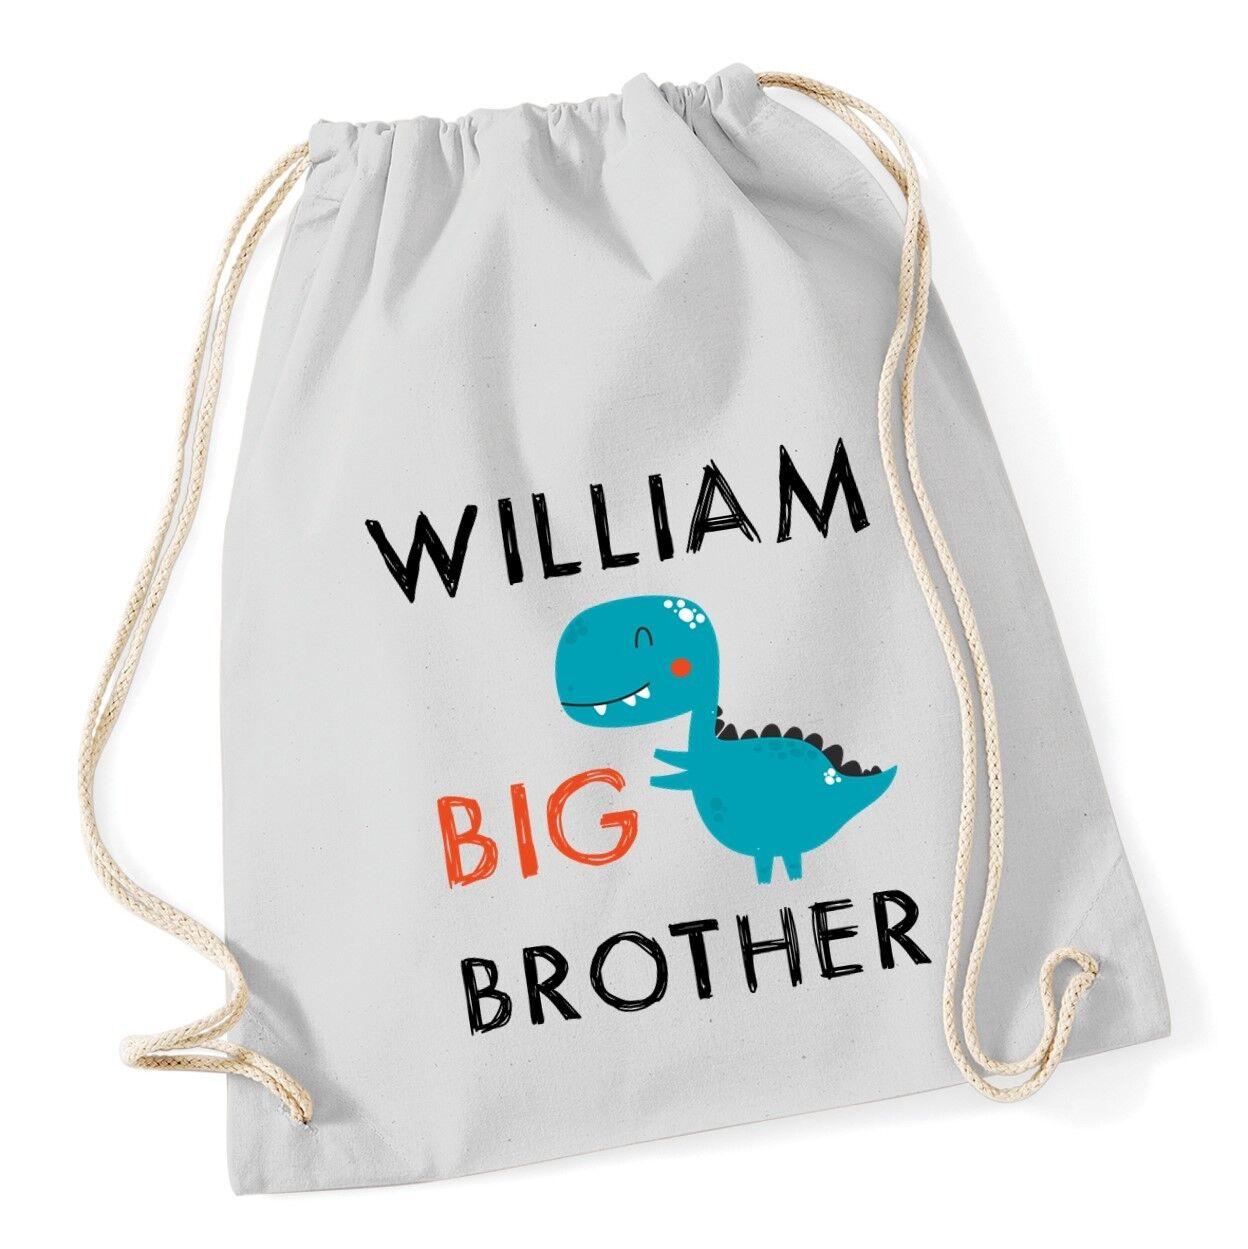 I/'M THE BIG BROTHER Gymsac Funny Printed Boys Blue Bag School PE Sports